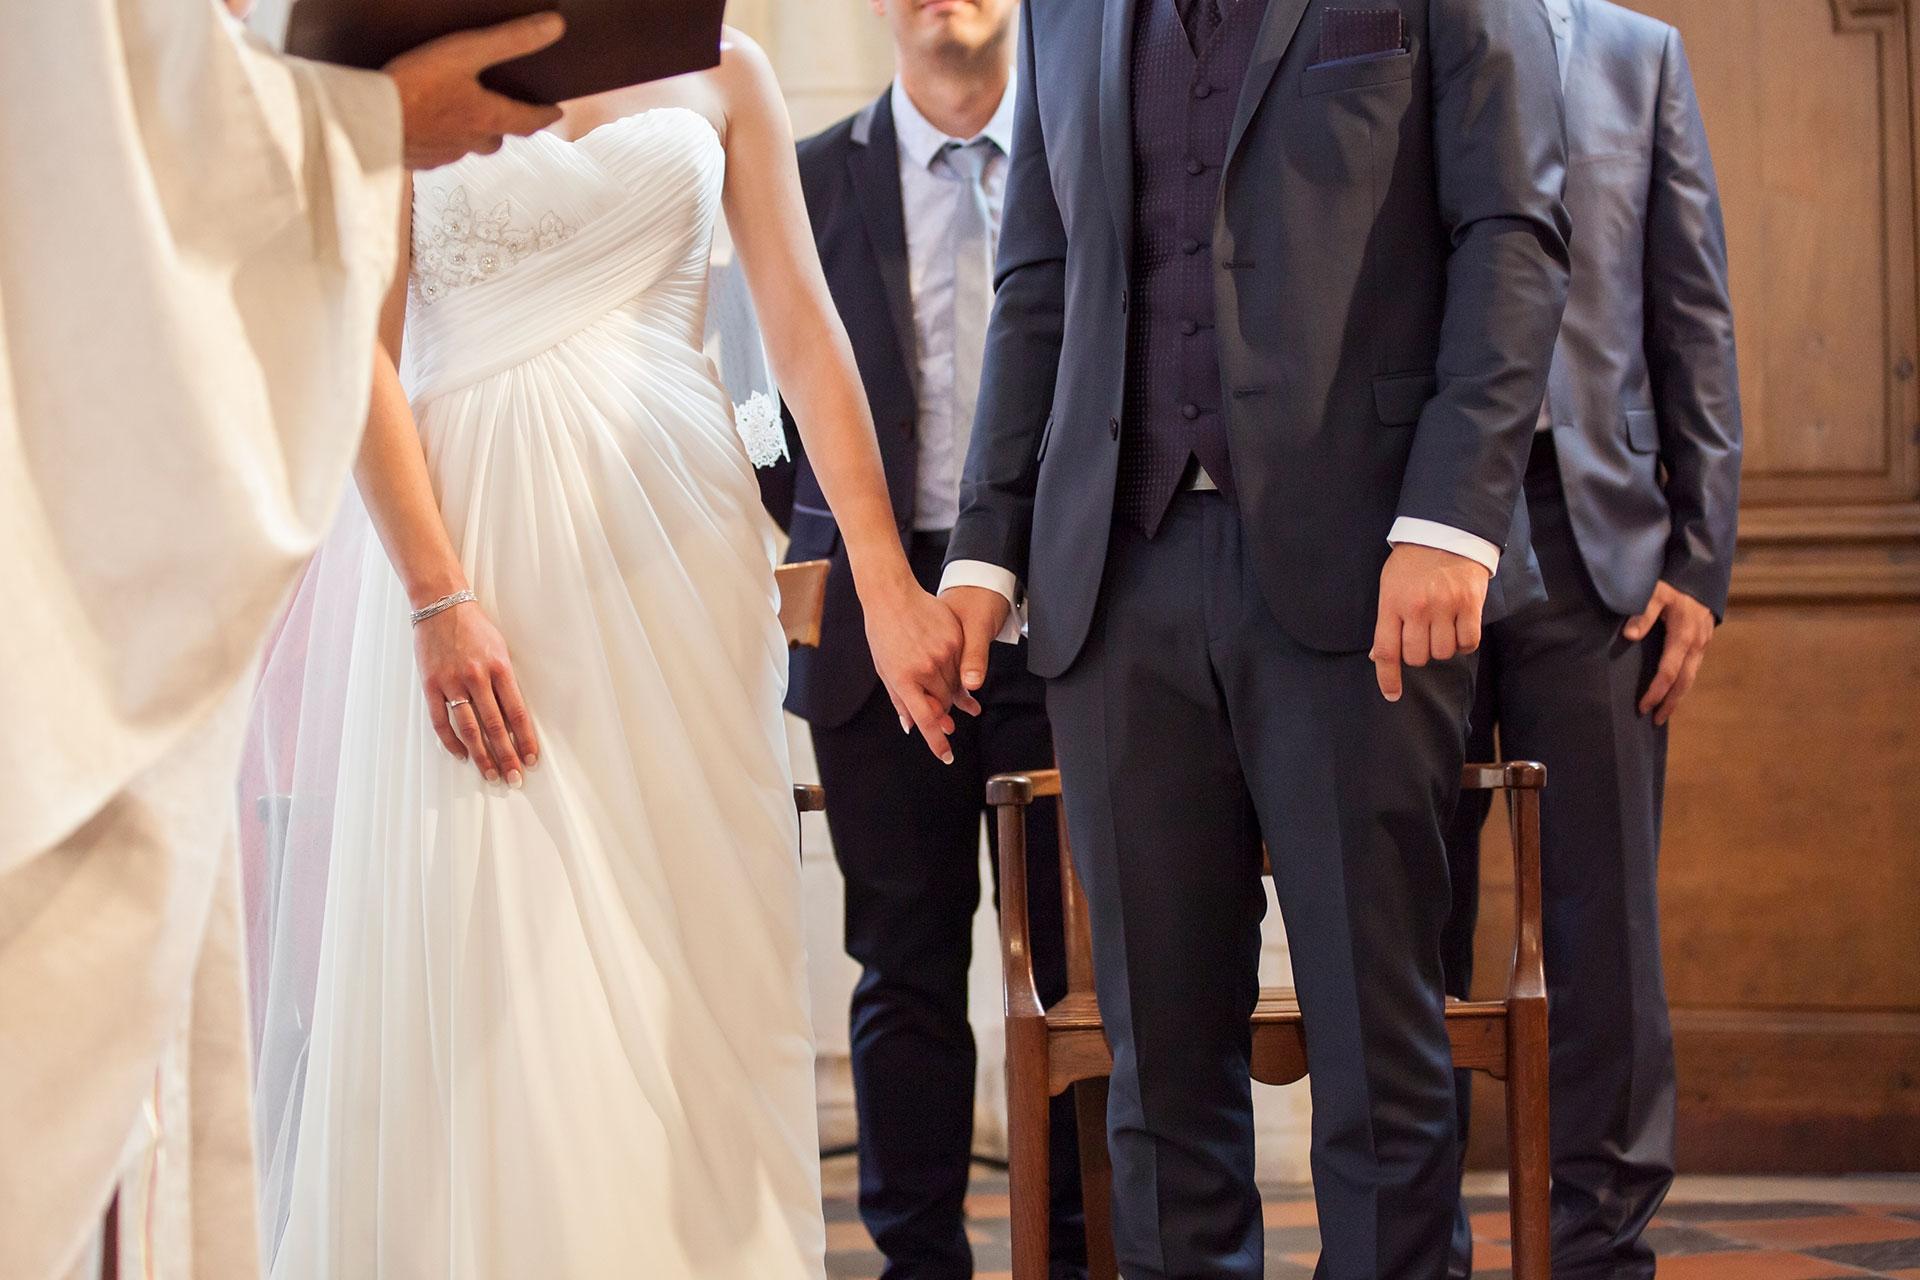 particuliers-evenements-mariages-oui-aurelie&geoffrey-15